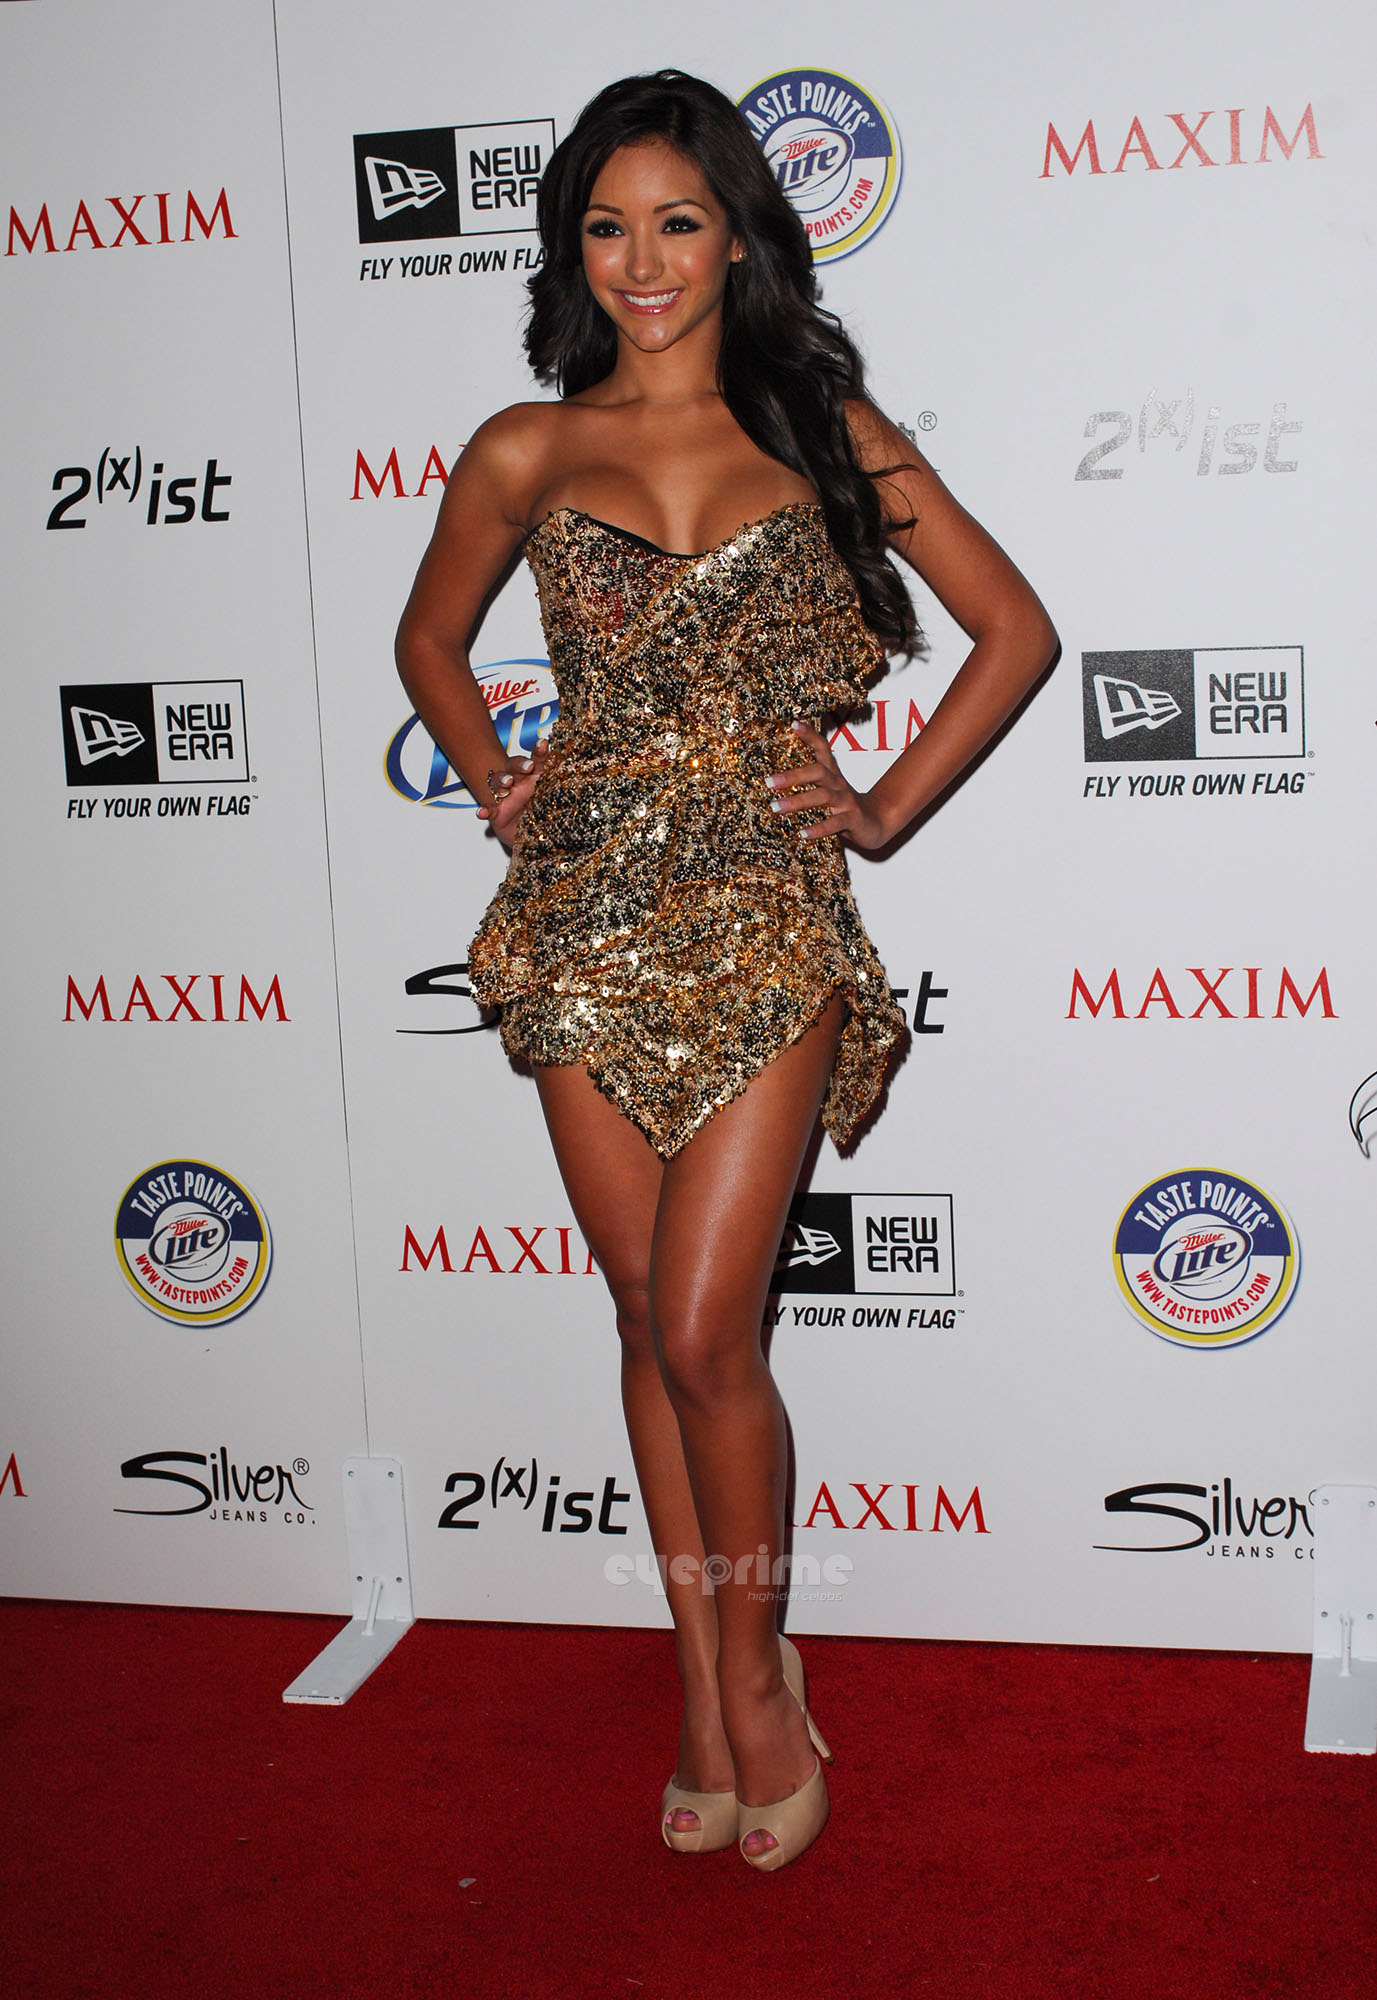 Melanie-Iglesias-Feet-408825.jpg